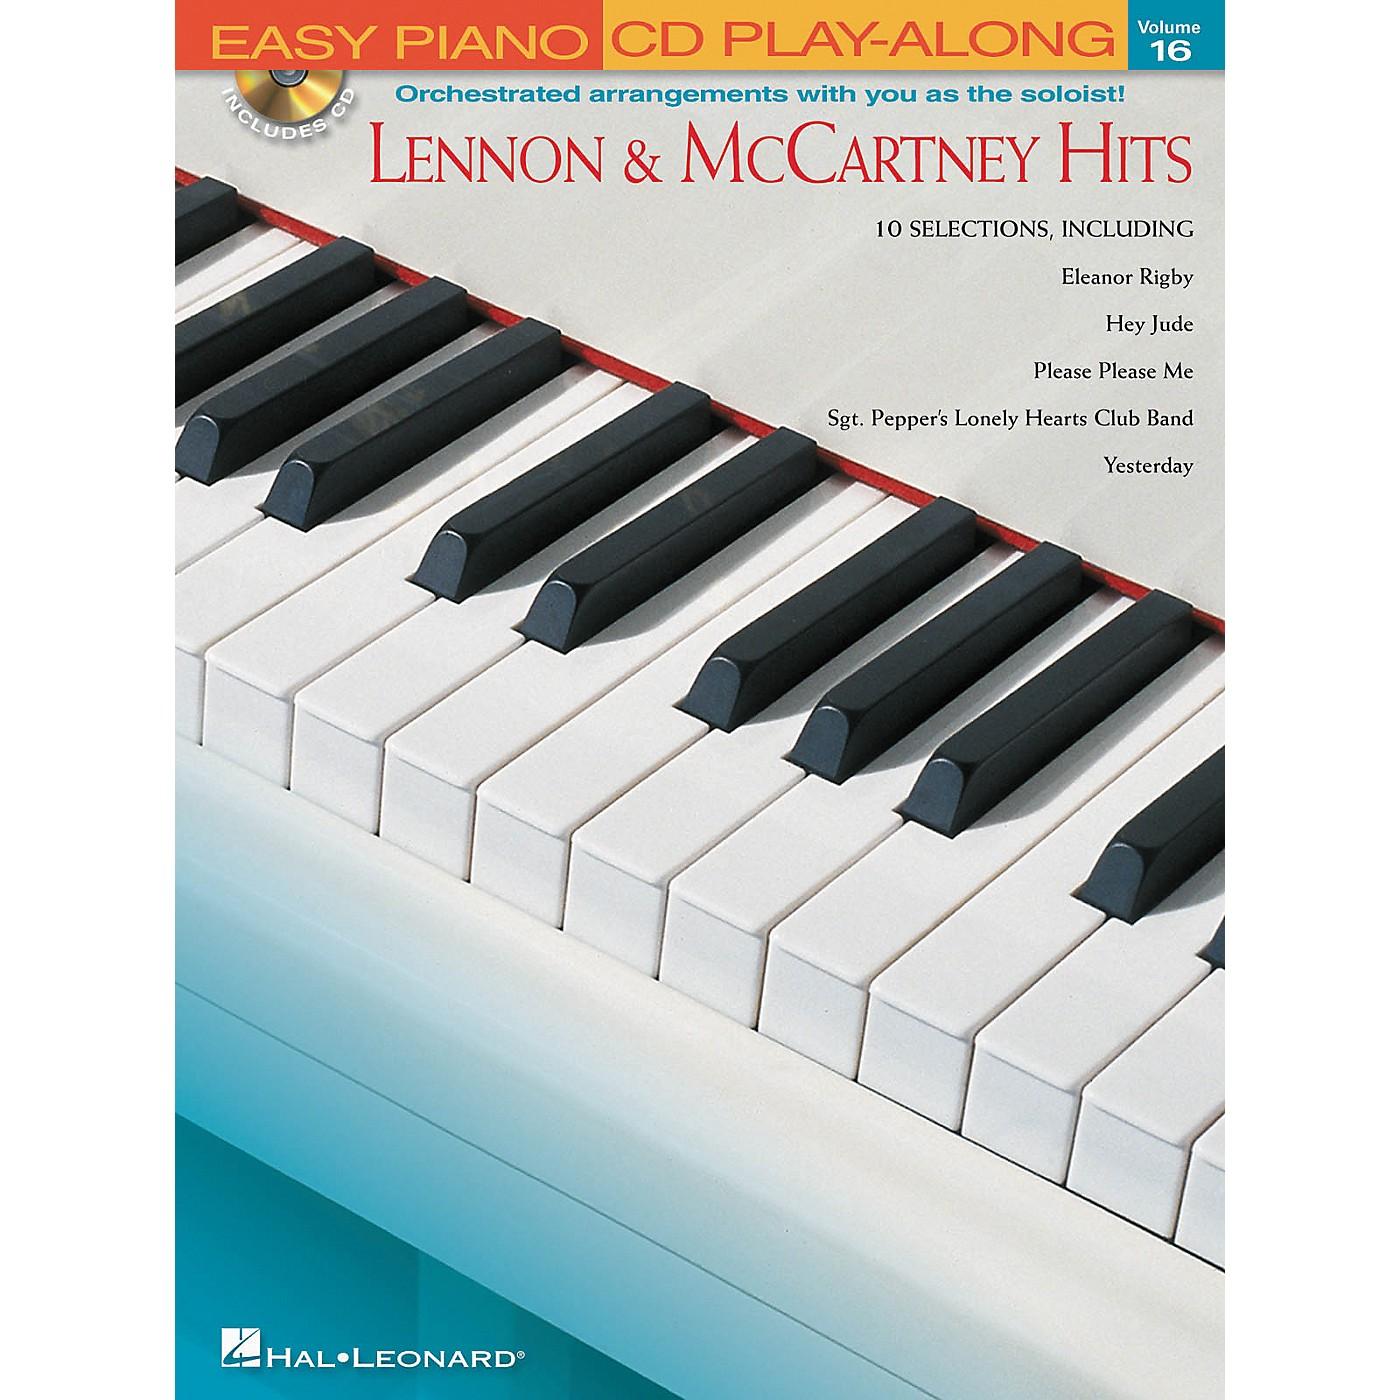 Hal Leonard Lennon & McCartney Hits - Easy Piano CD Play-Along Volume 16 Book/CD thumbnail